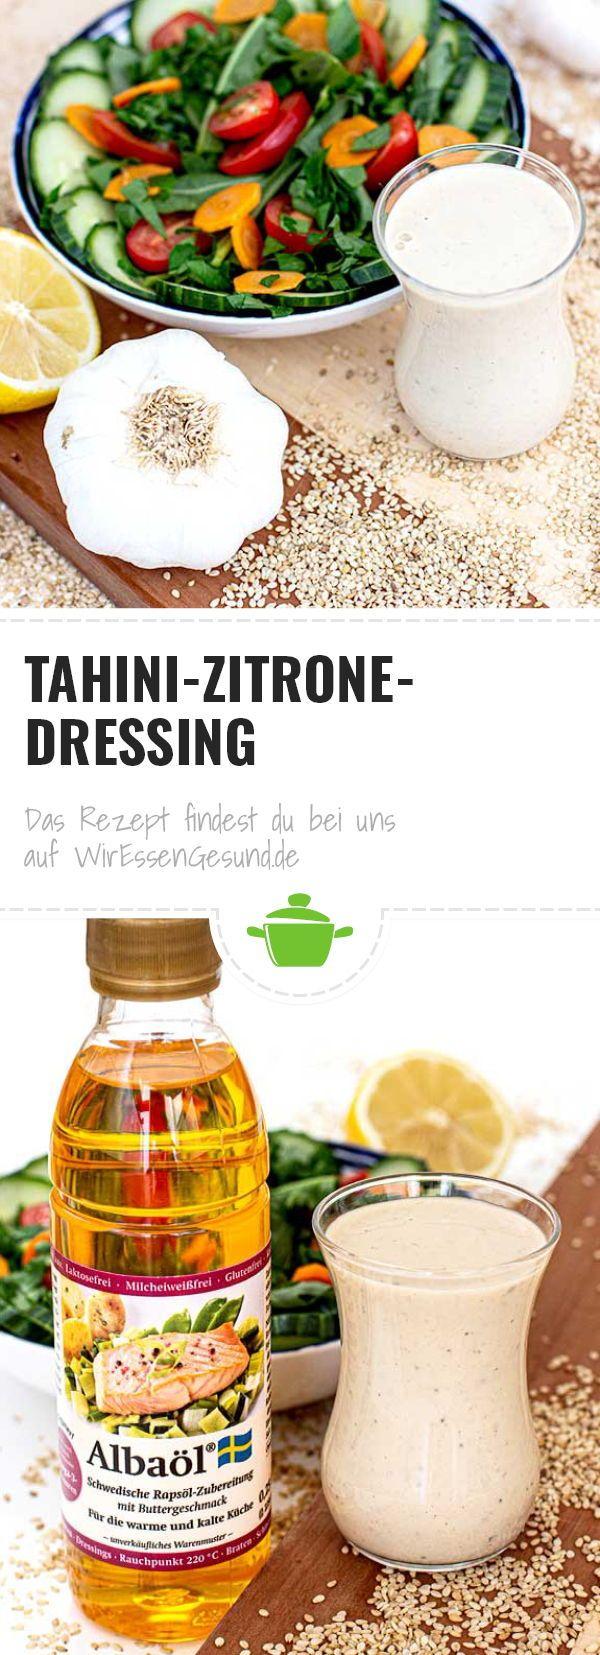 Tahini-Zitrone-Dressing